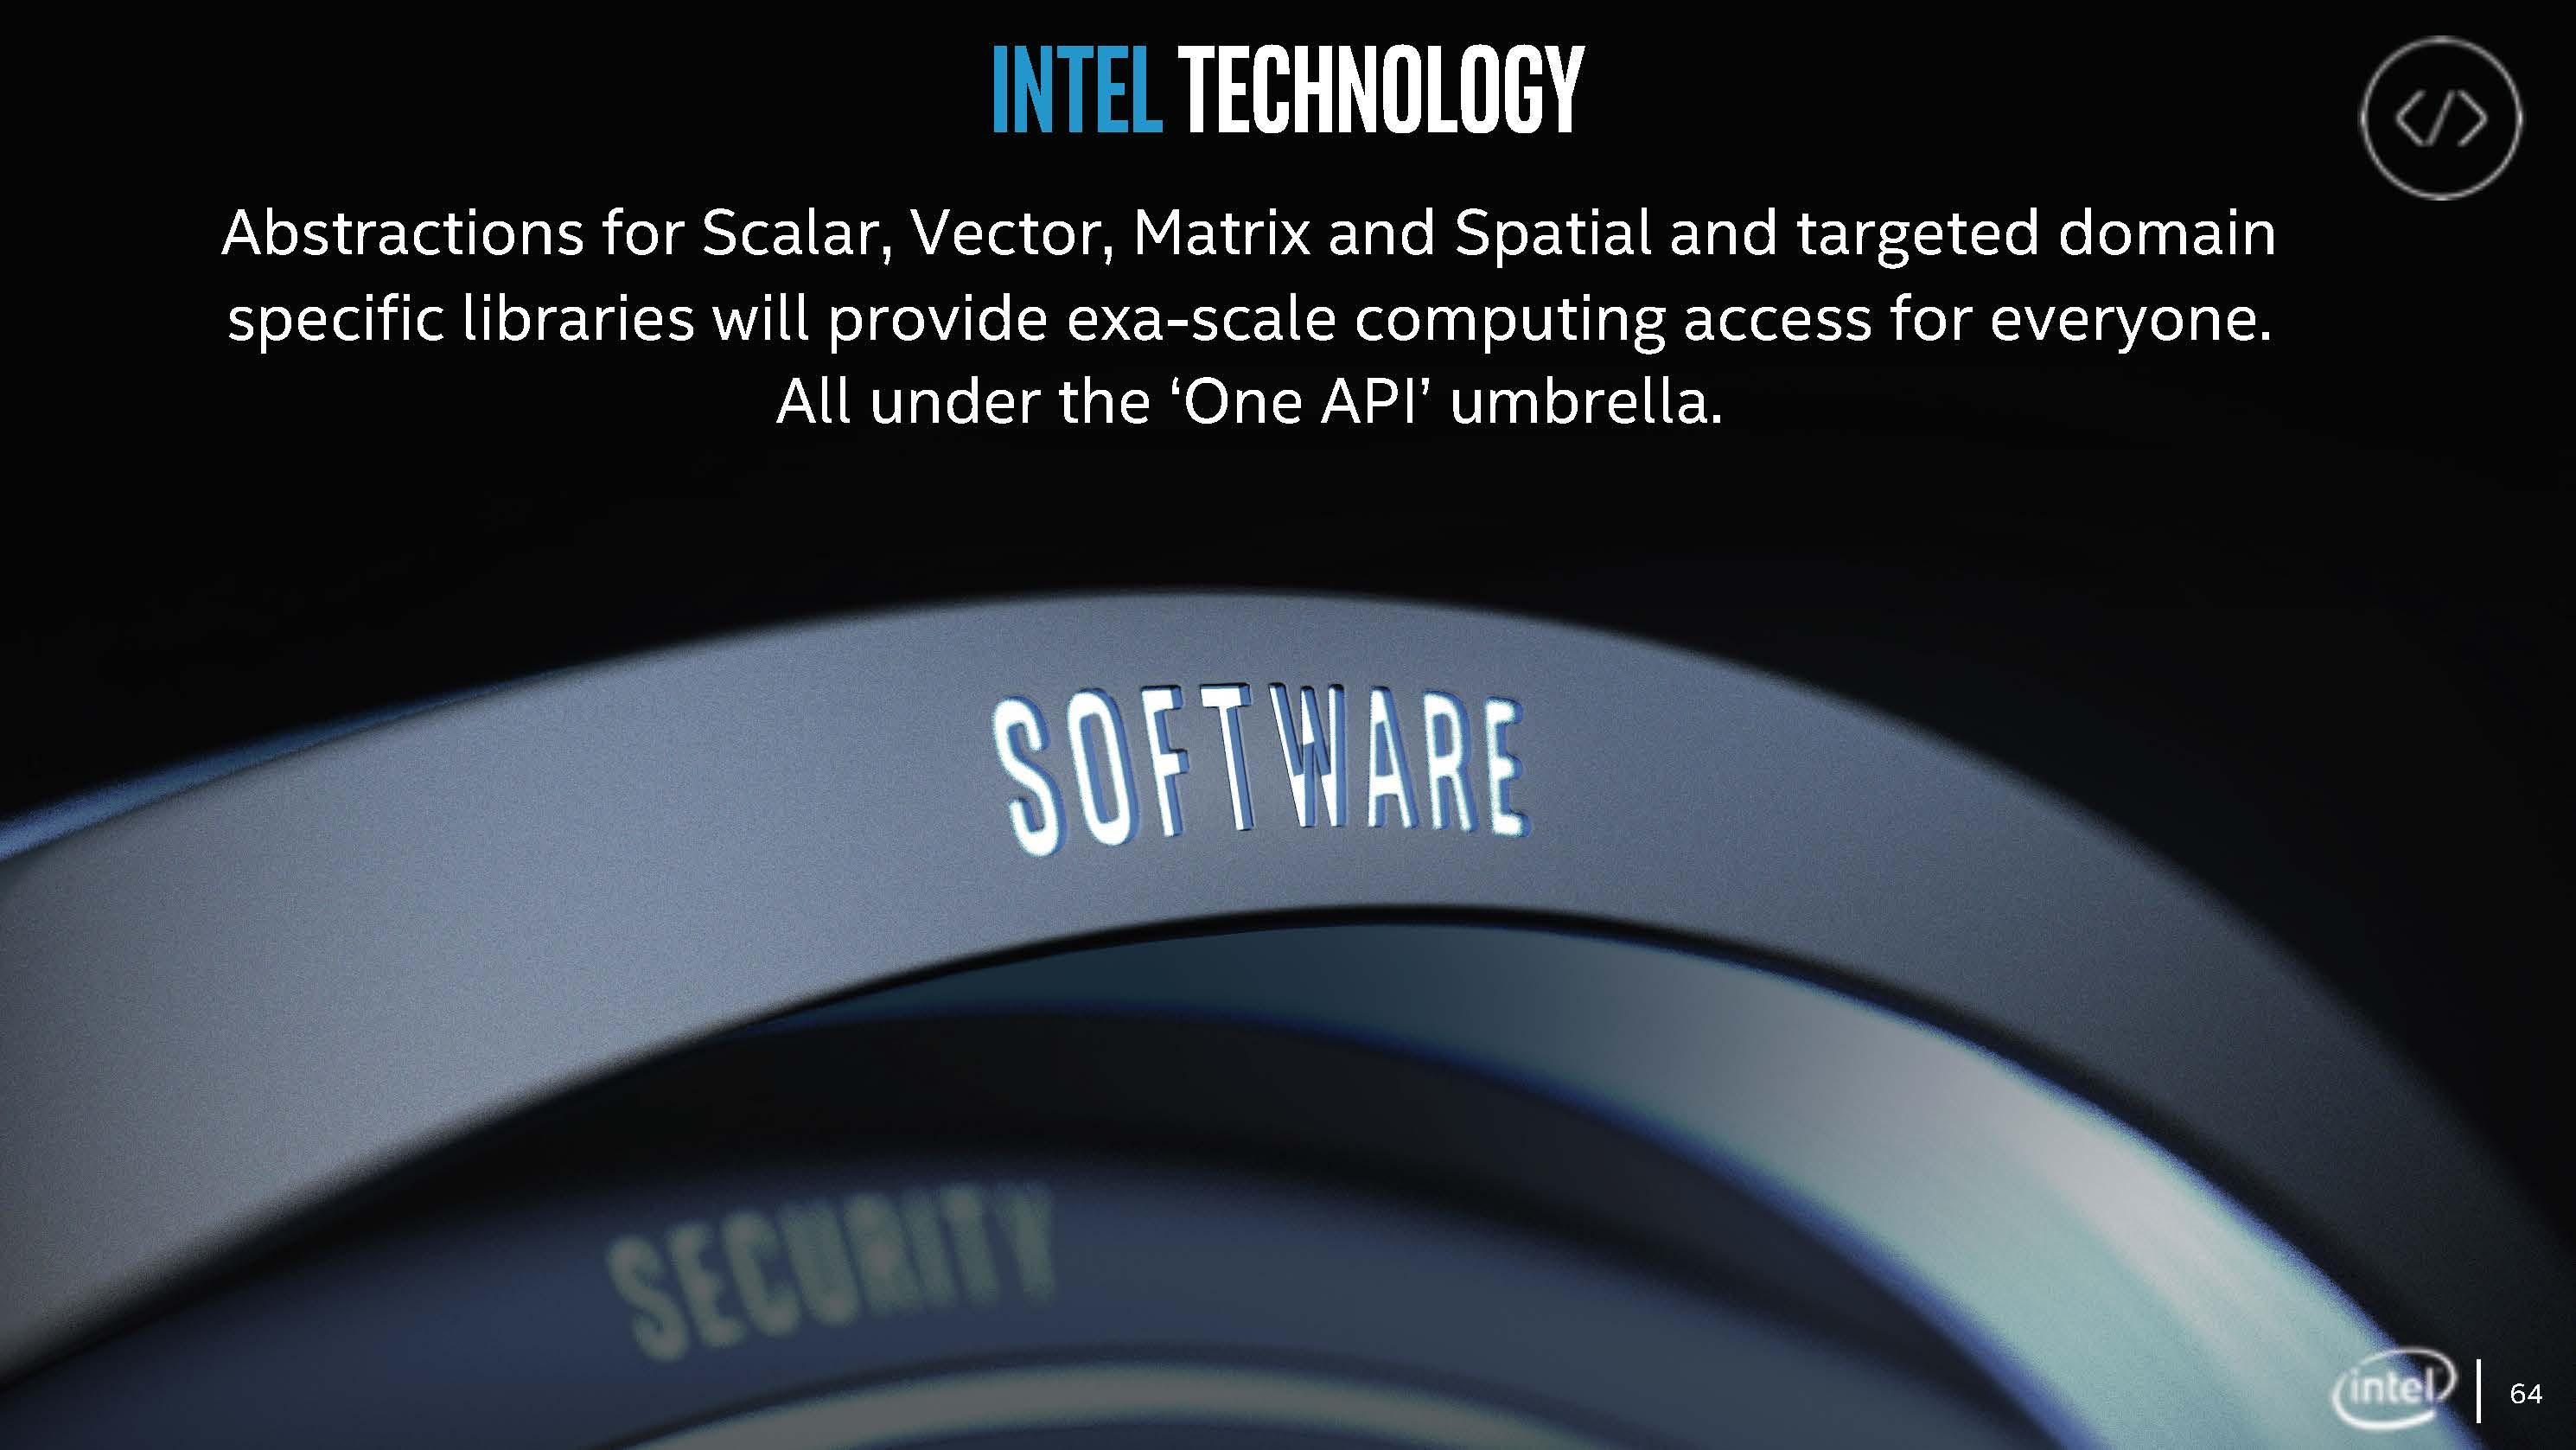 Intel One API Vision